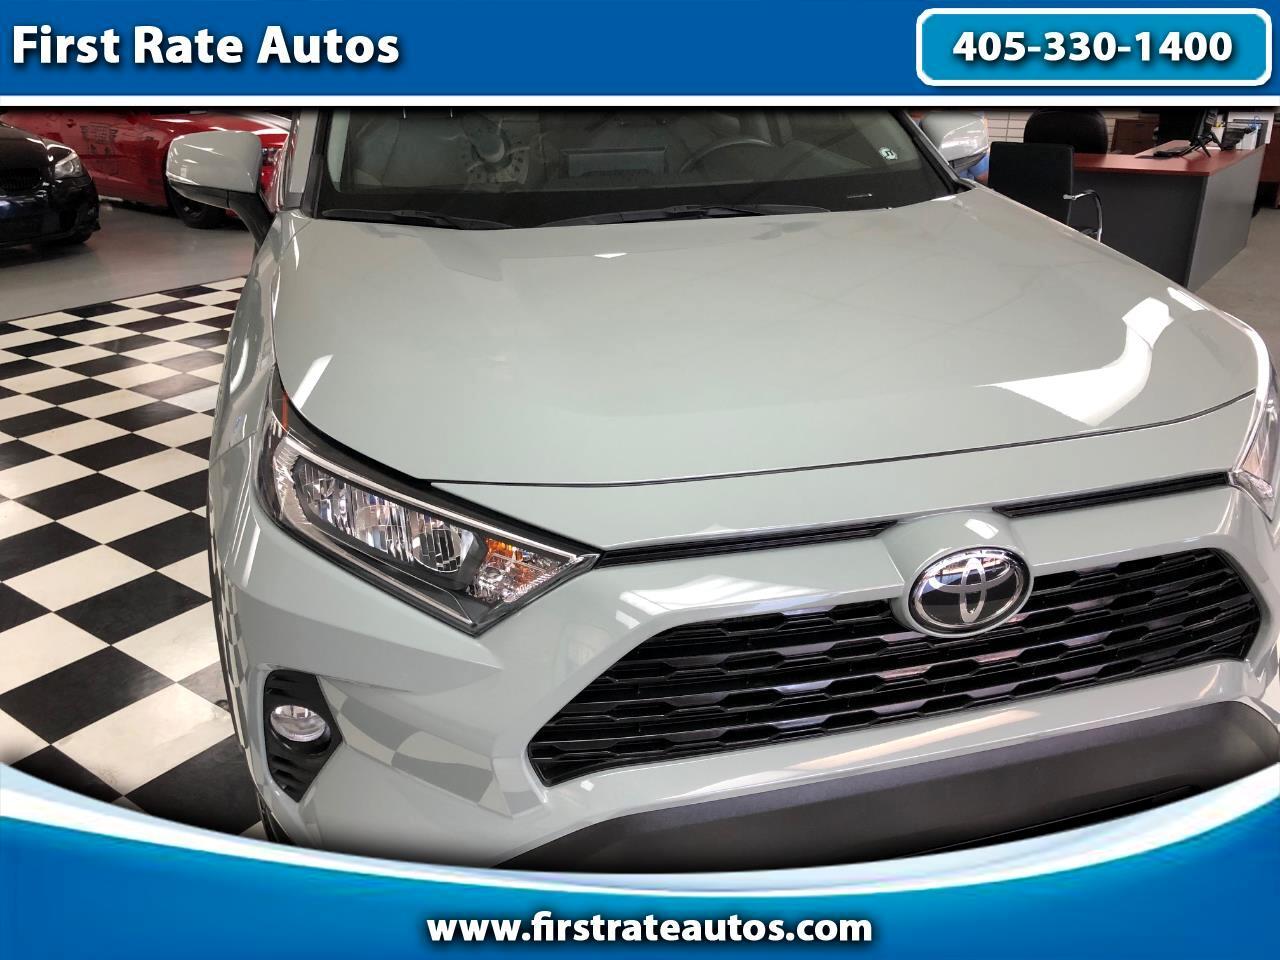 2020 Toyota RAV4 XLE Premium FWD (Natl)